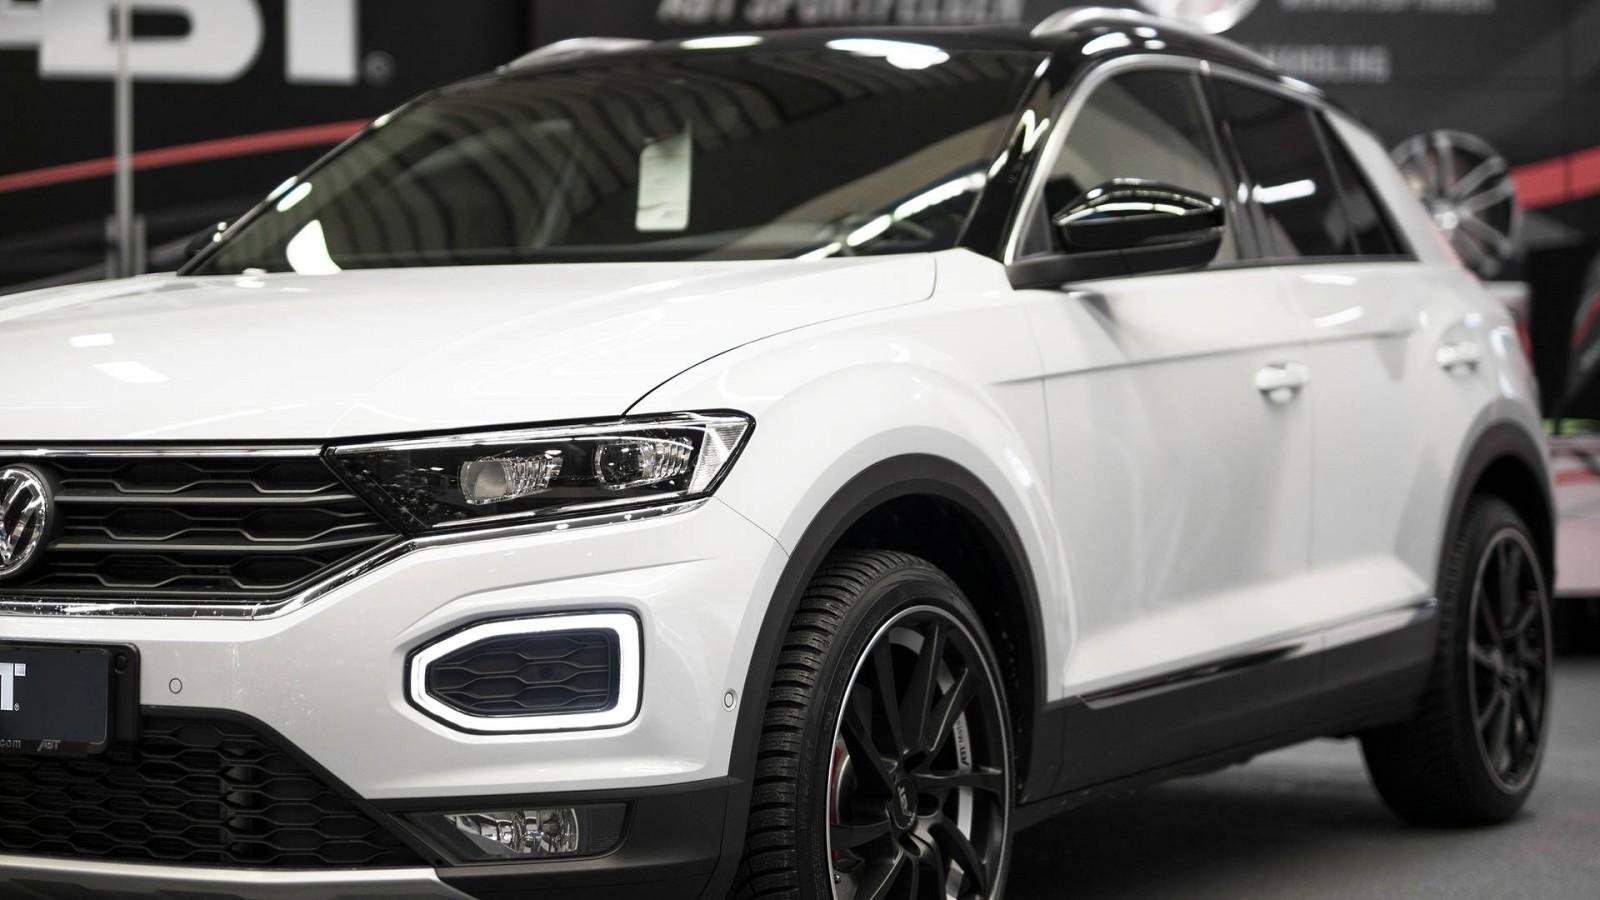 (foto) ABT Sportsline a pregătit primul program de tuning pentru Volkswagen T-Roc